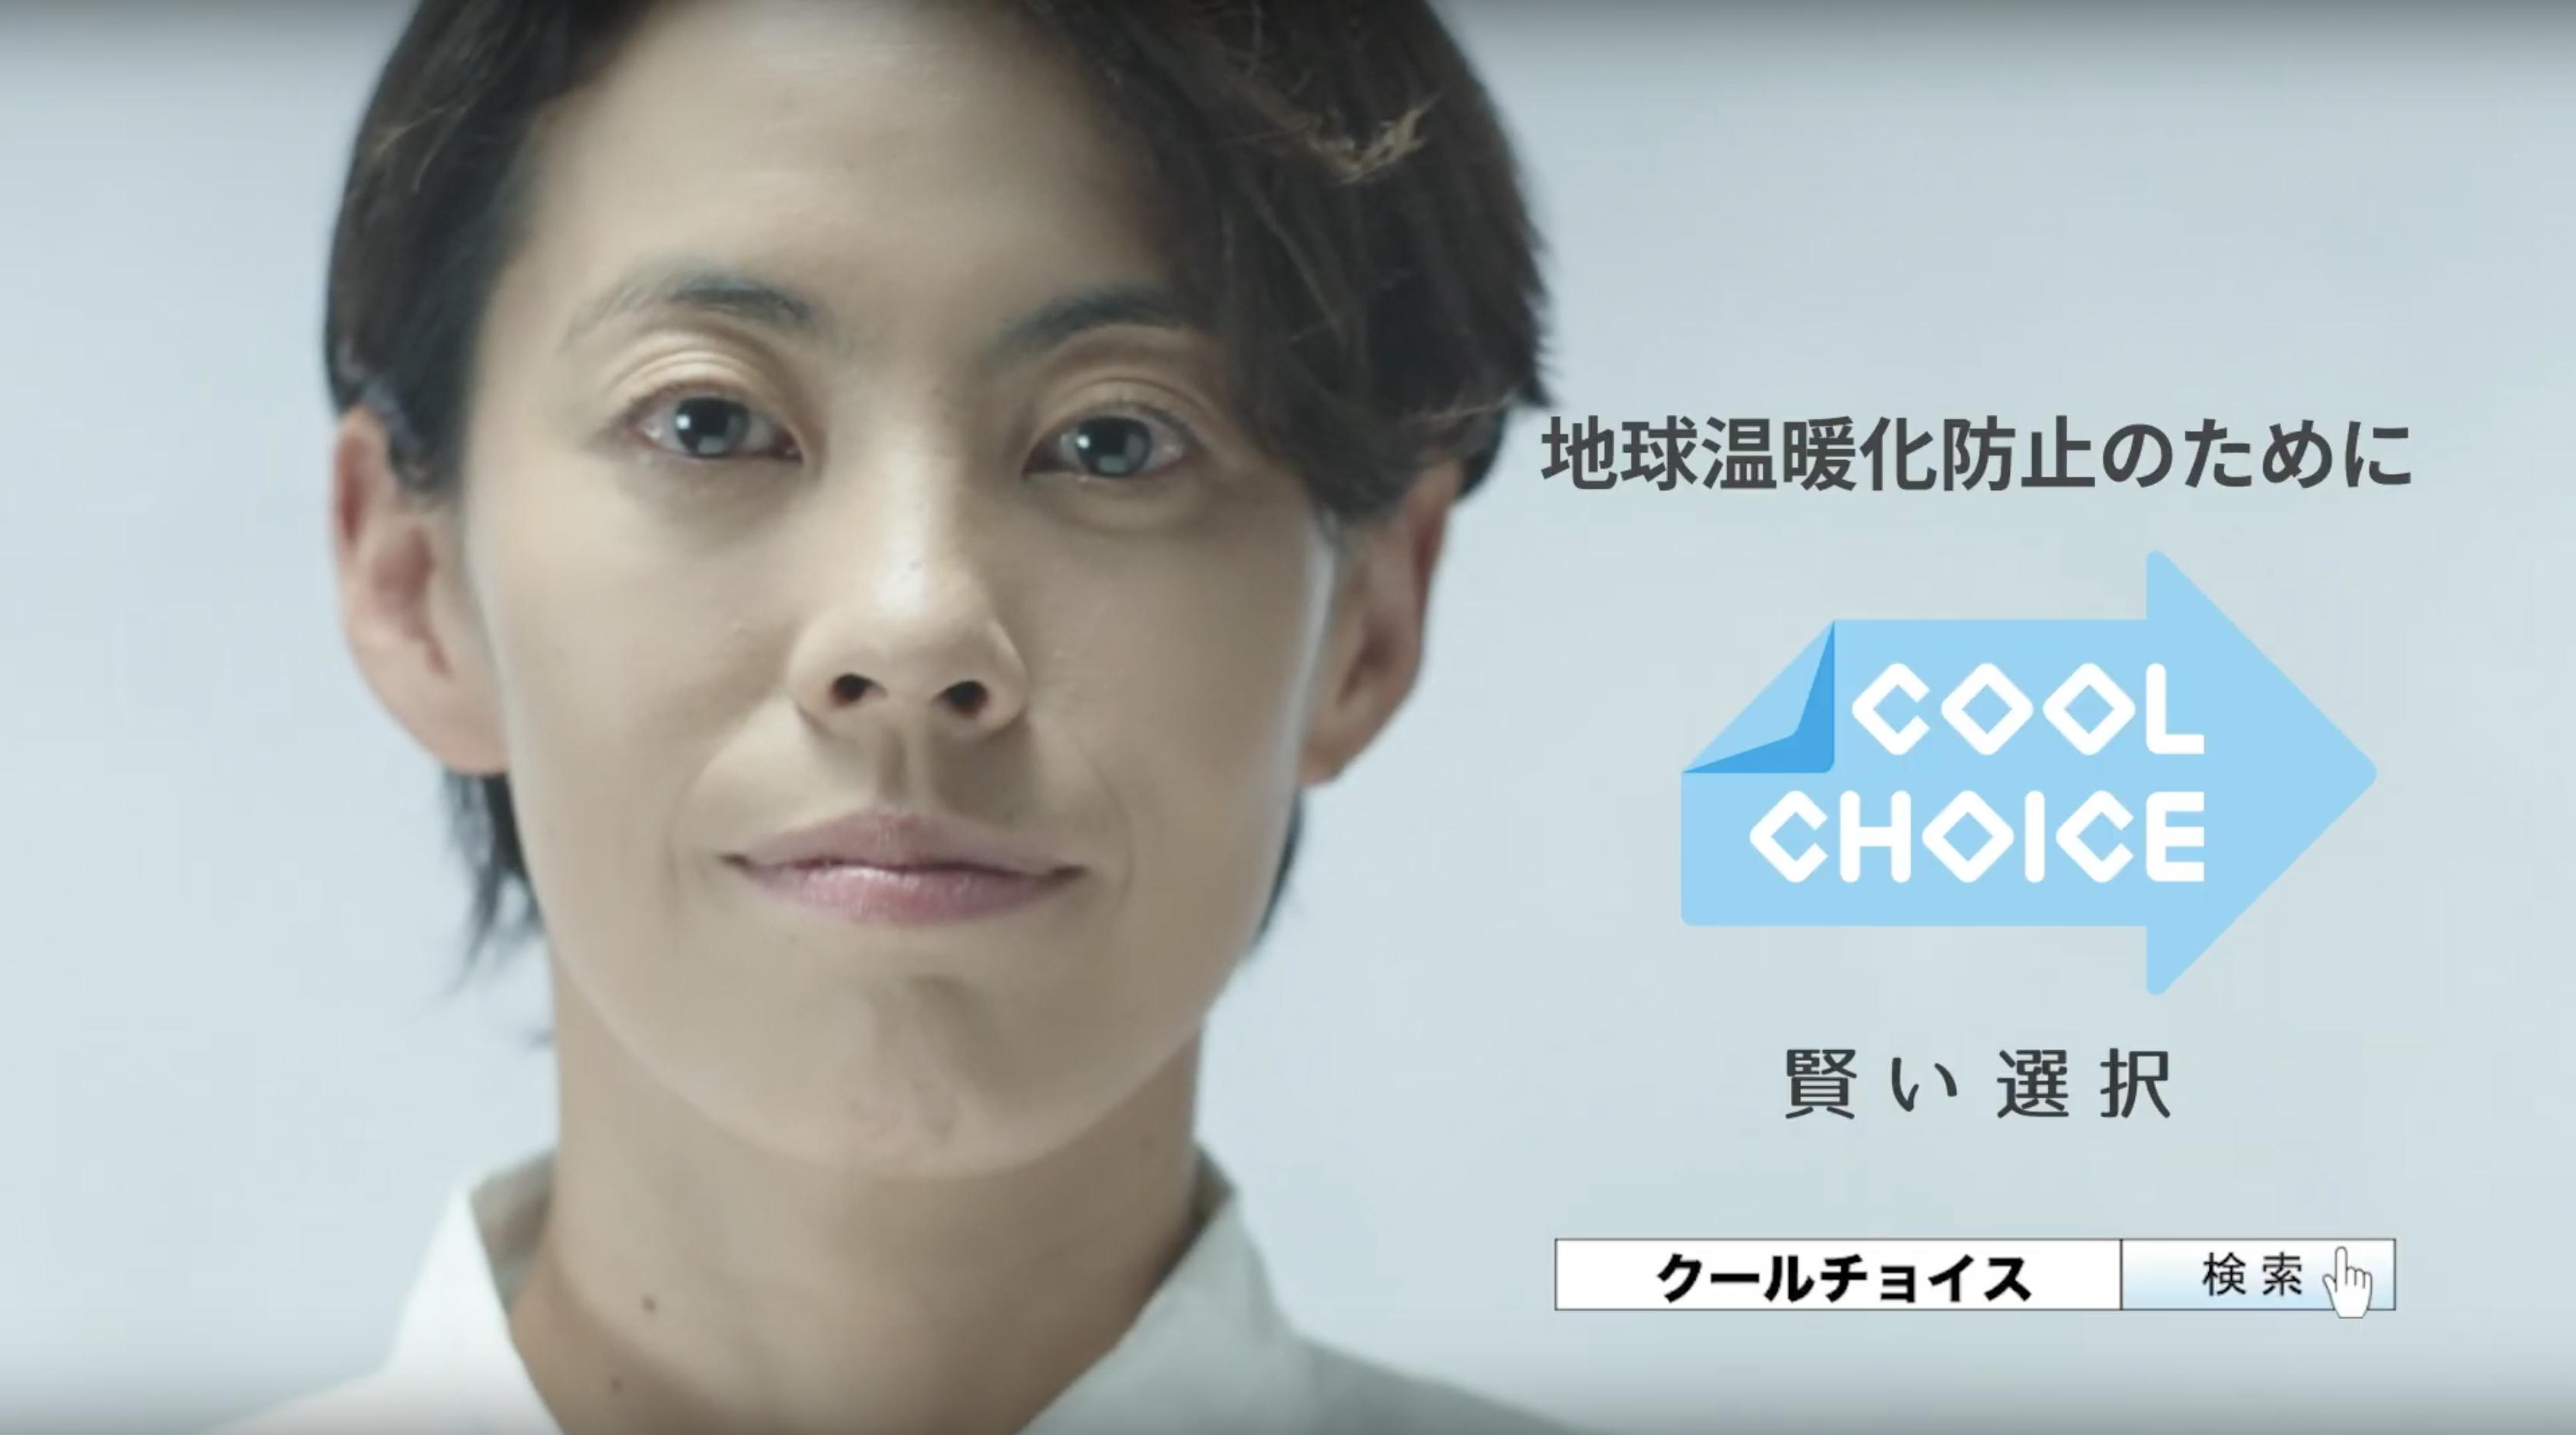 COOL CHOICE 賢い選択 トライアスロン上田 藍 編